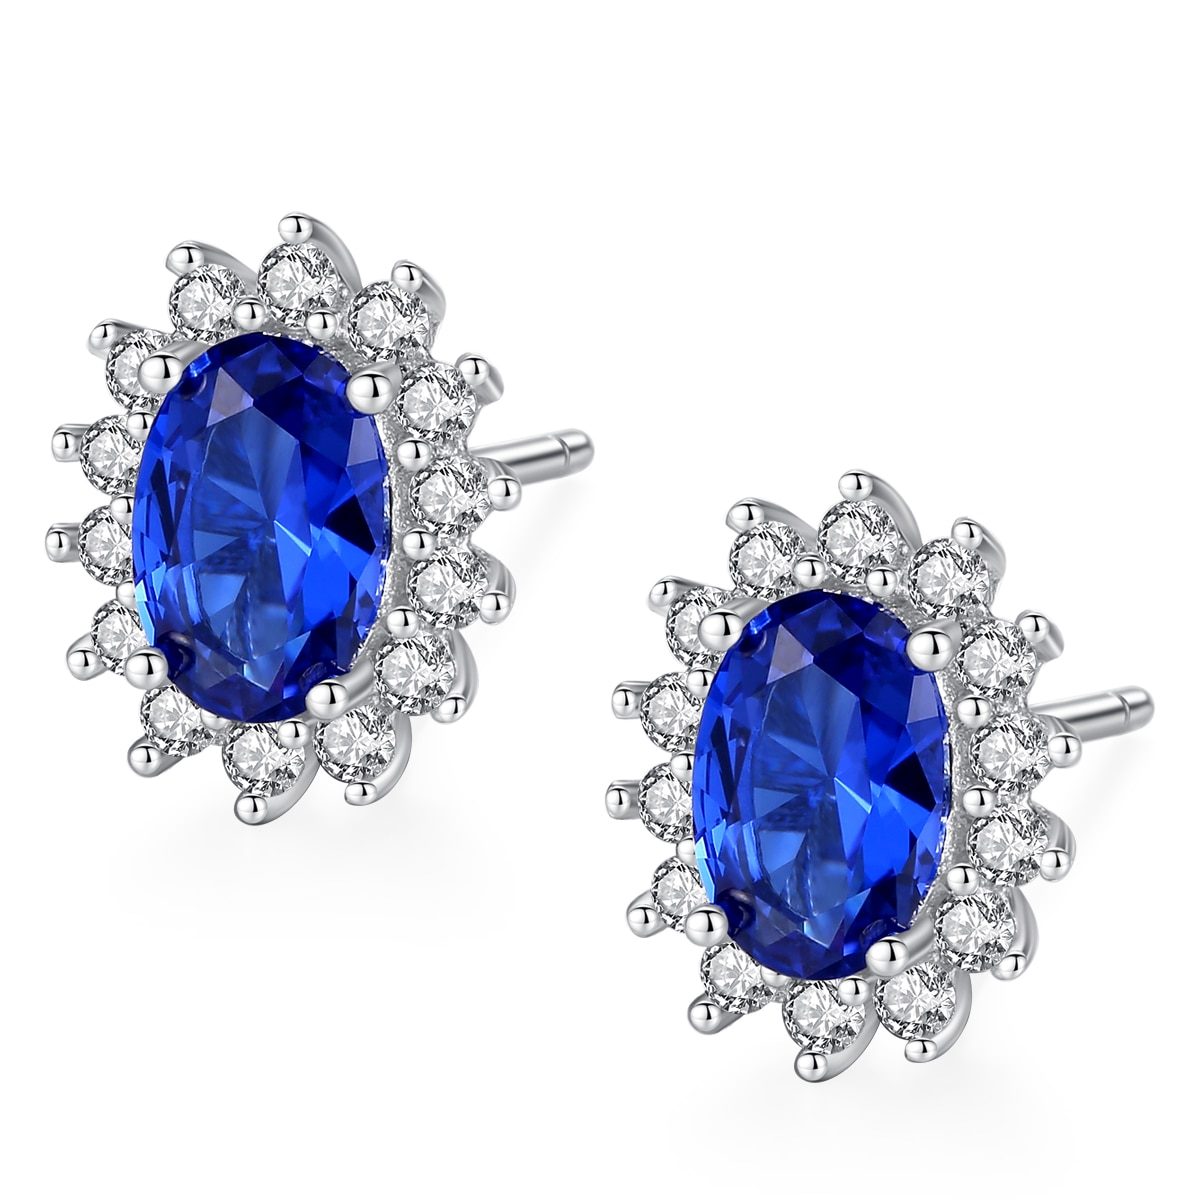 Allakalo natural birthstone azul real oval safira brincos sólidos 925 prata esterlina jóias finas para presente feminino ae001